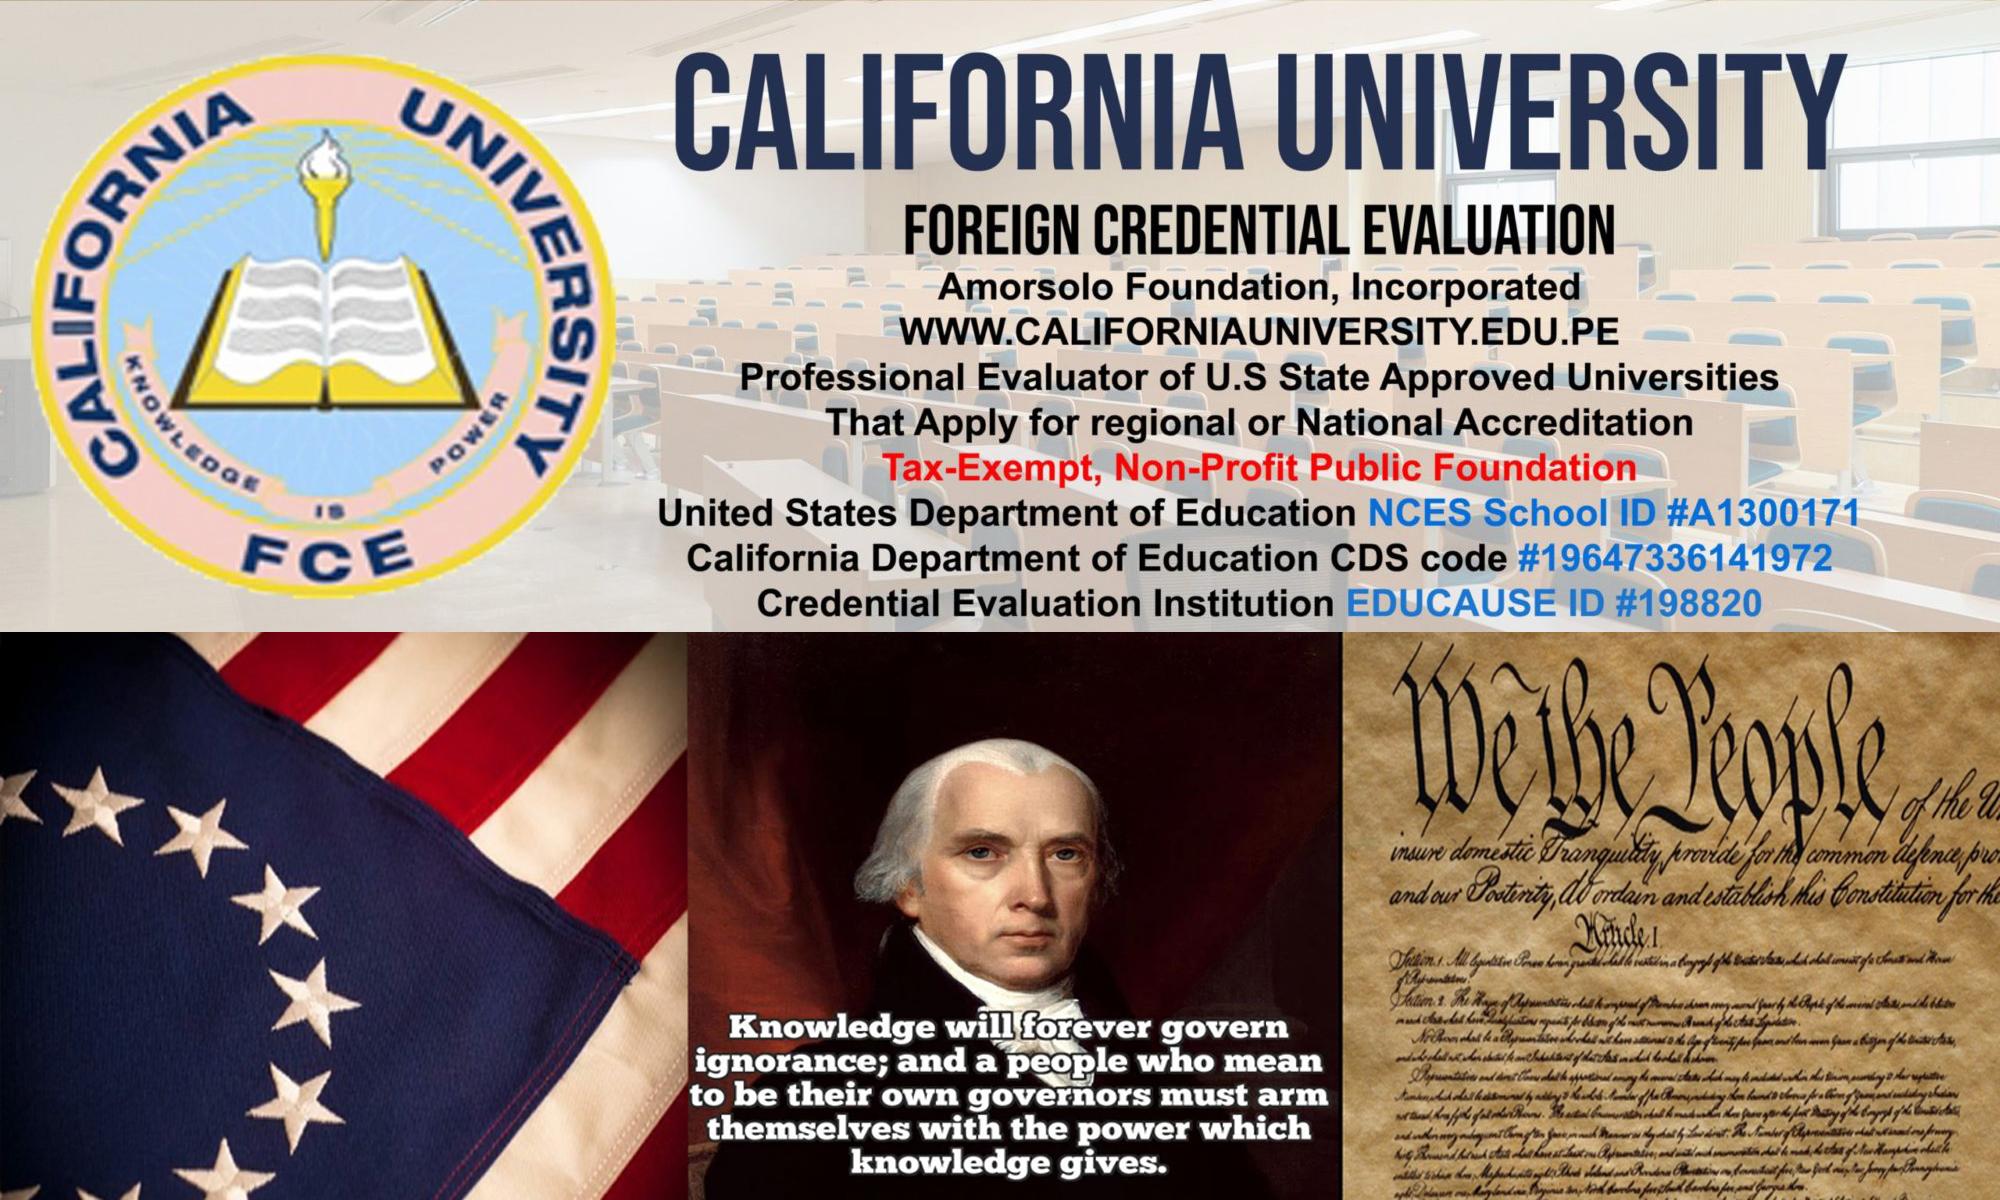 California University FCE | Credential evaluation